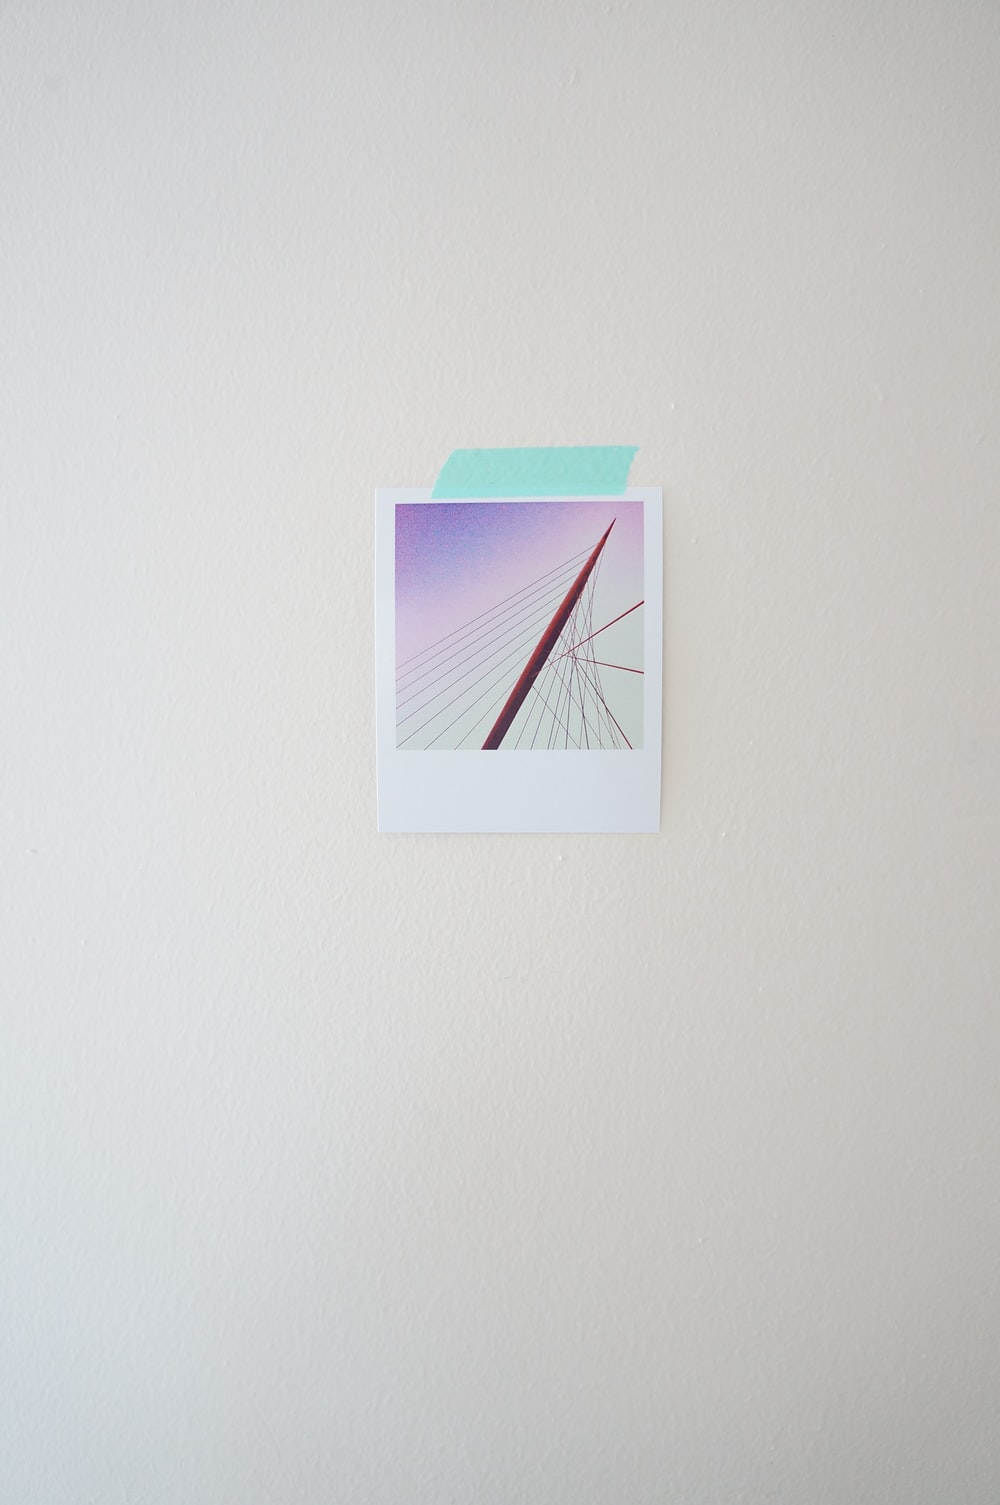 pink and white wall clock at 7 00